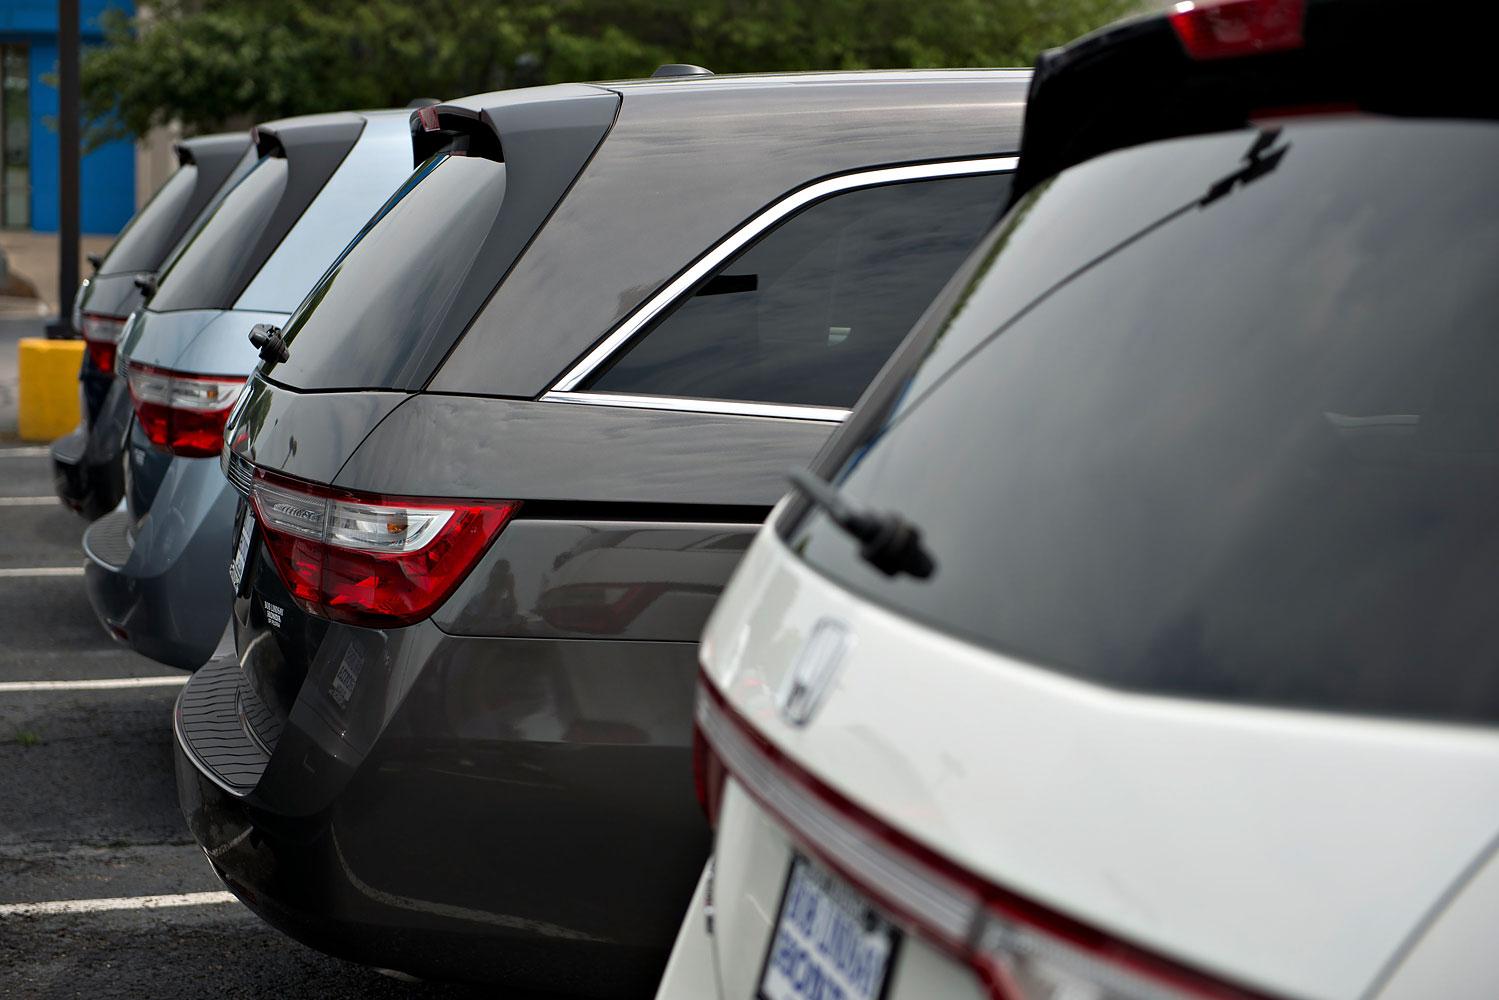 2013 Honda Odyssey minivans sit outside Bob Lindsay Honda in Peoria, Illinois, June 25, 2013.